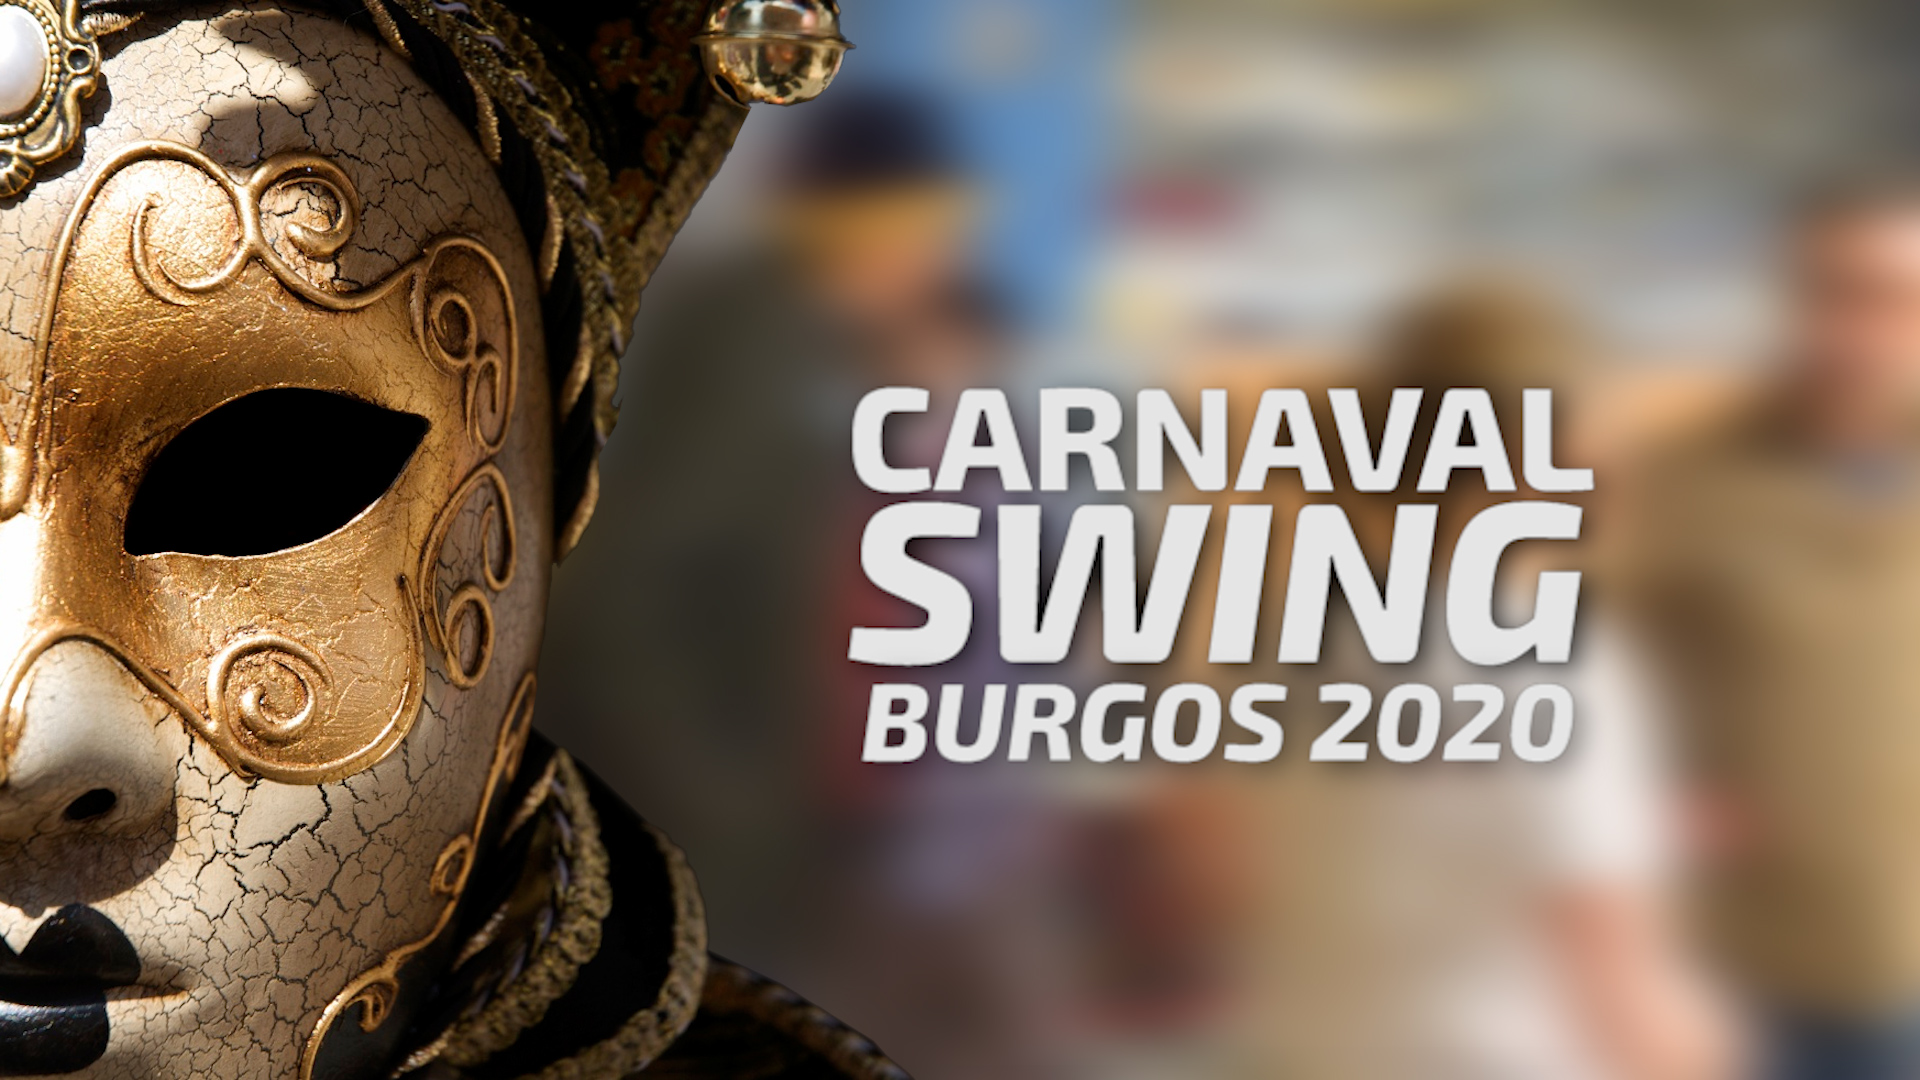 carnaval swing 2020 burgos video